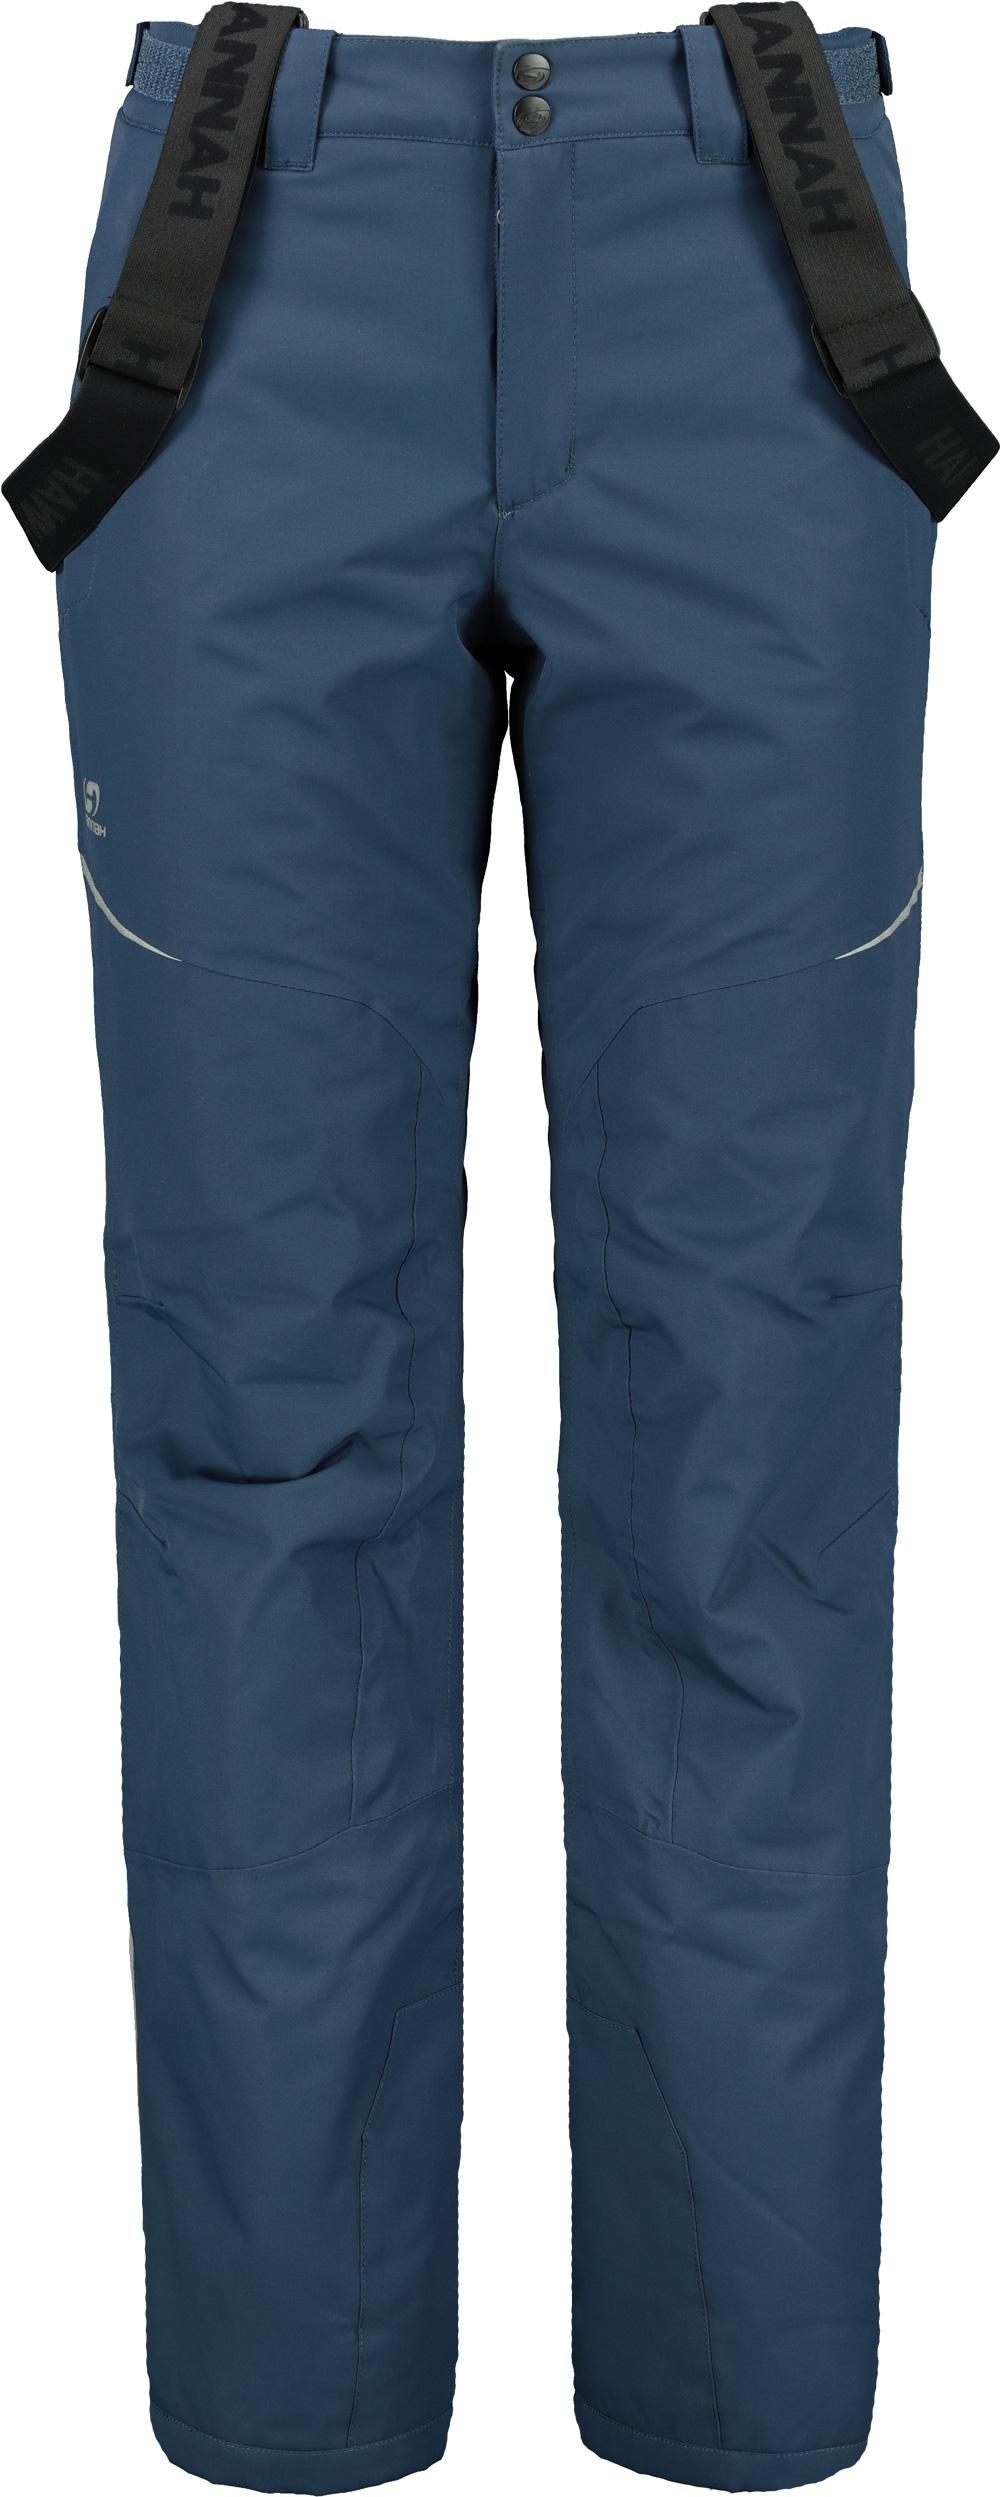 Kalhoty dětské HANNAH KAROK JR